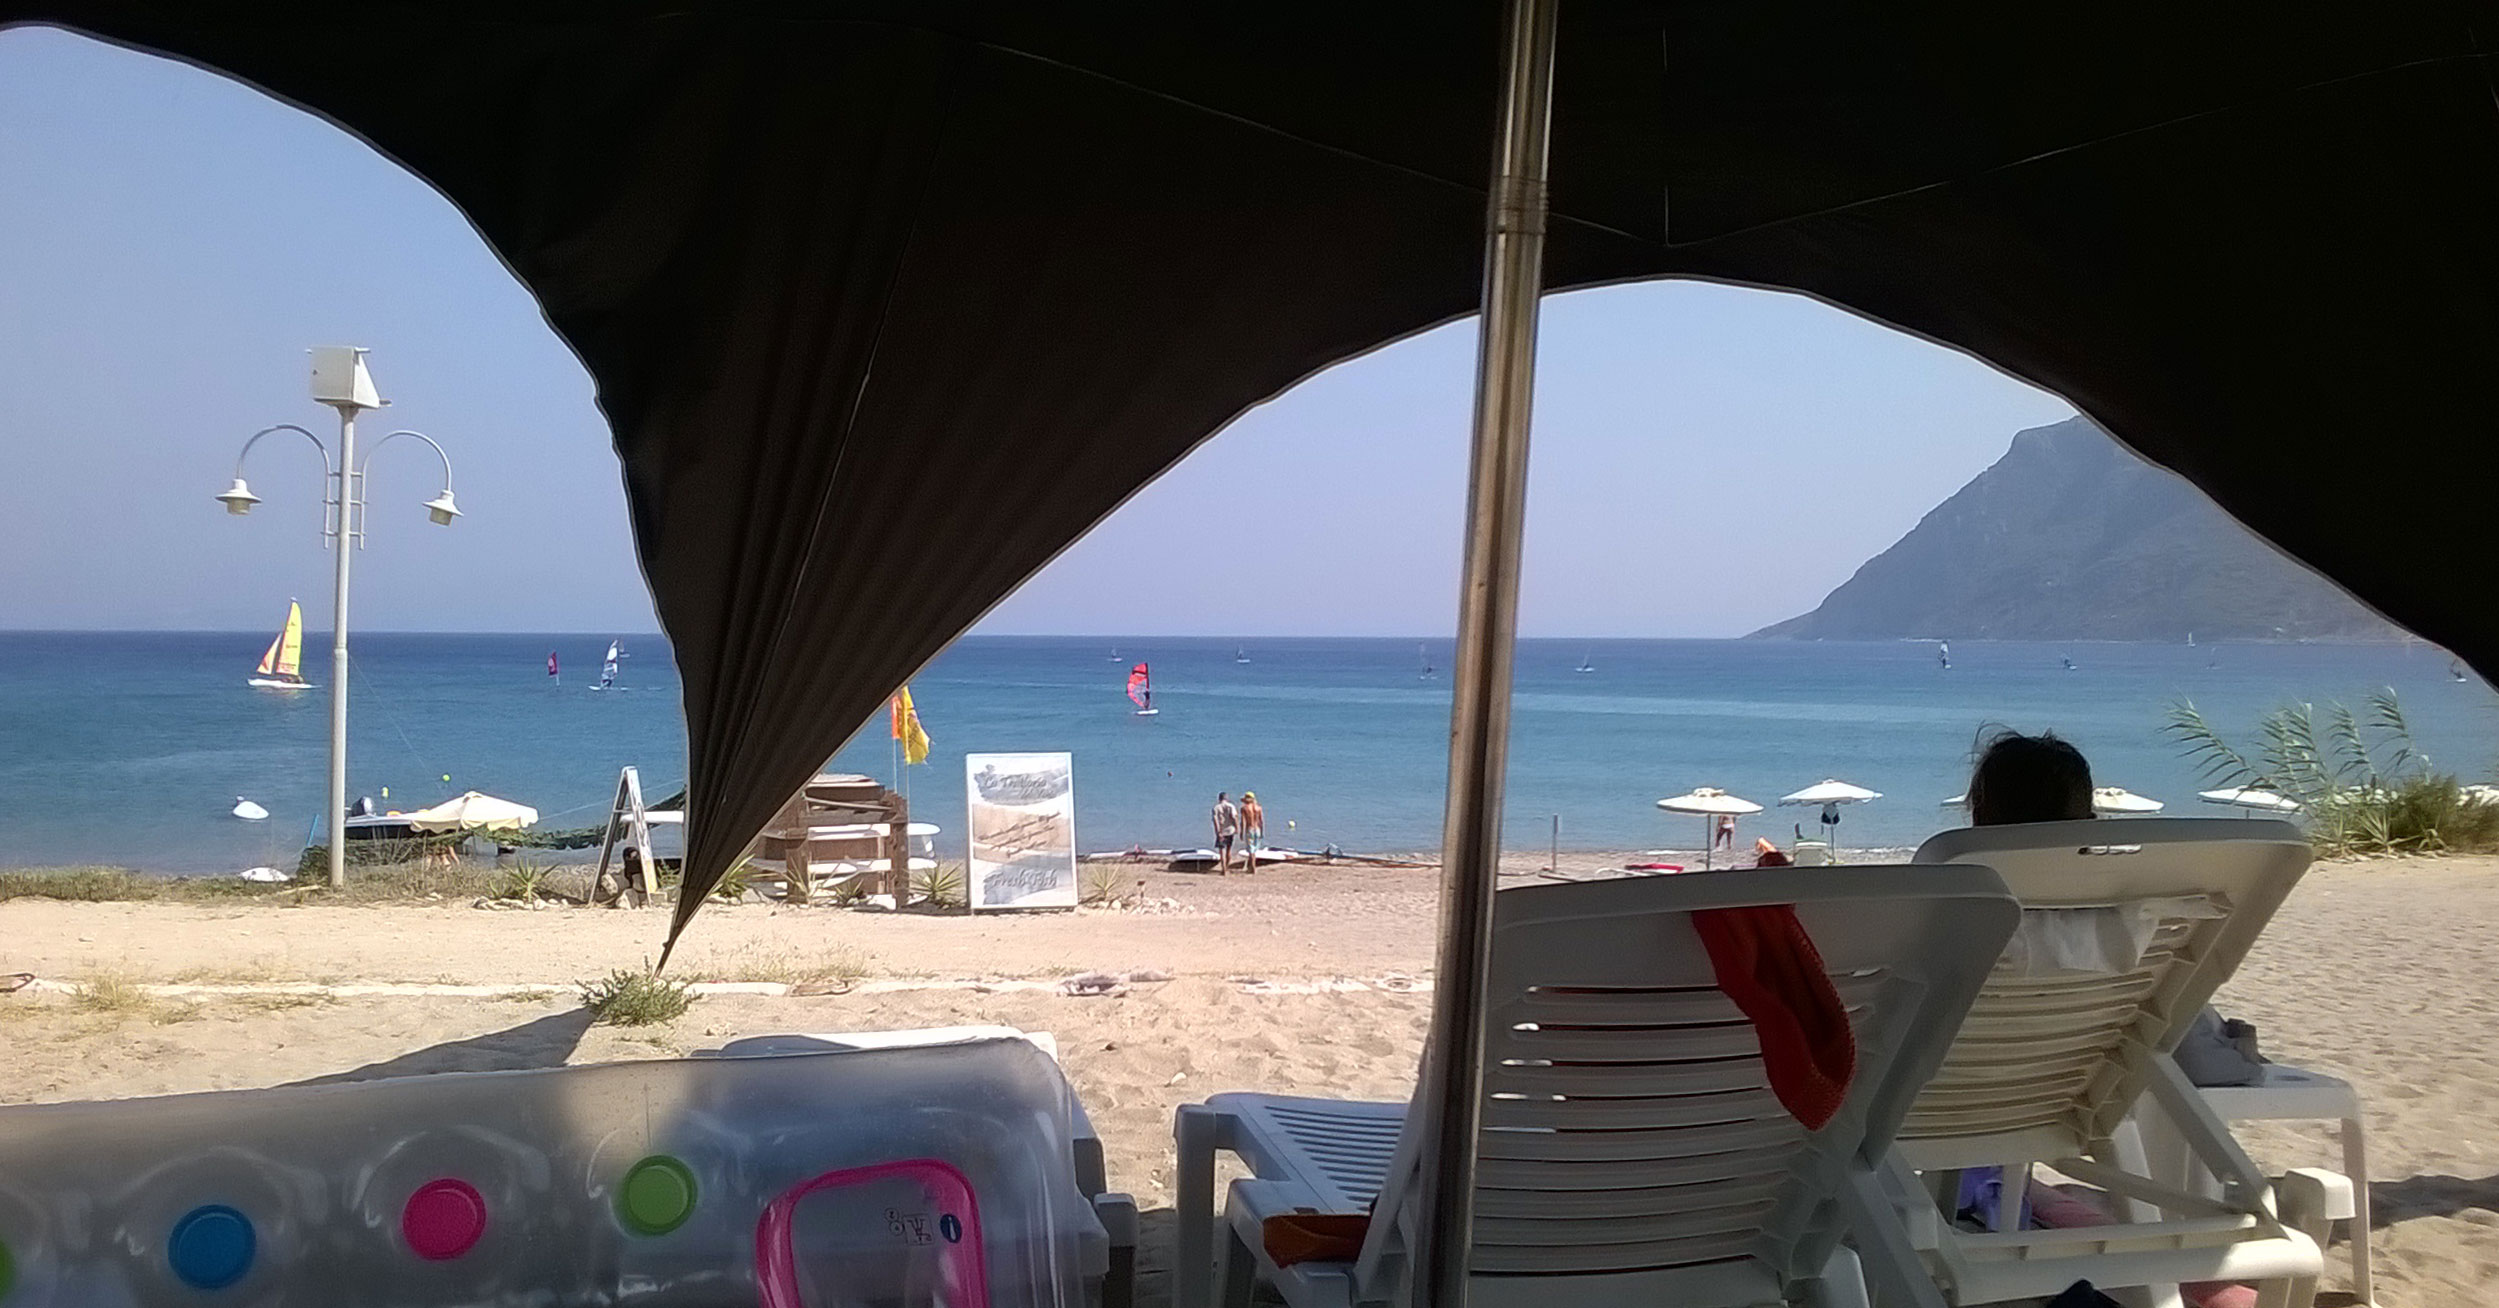 лежачки в тени около моря